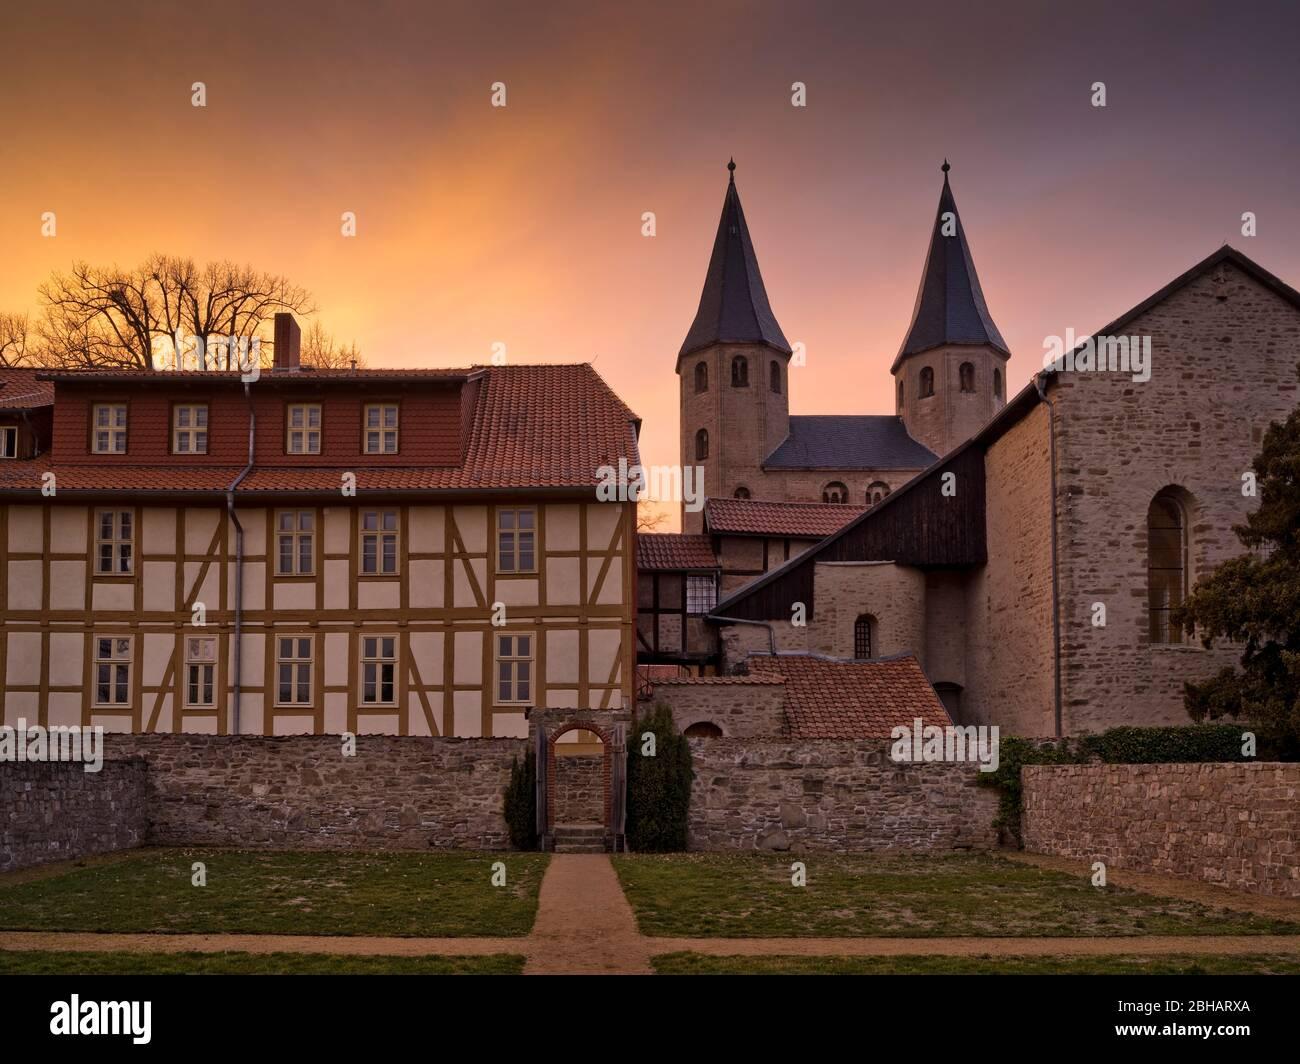 Europe, Germany, Saxony-Anhalt, Ilsenburg, Drübeck Abbey, Benedictine Convent of St. Vitus, 10th century, evening mood Stock Photo